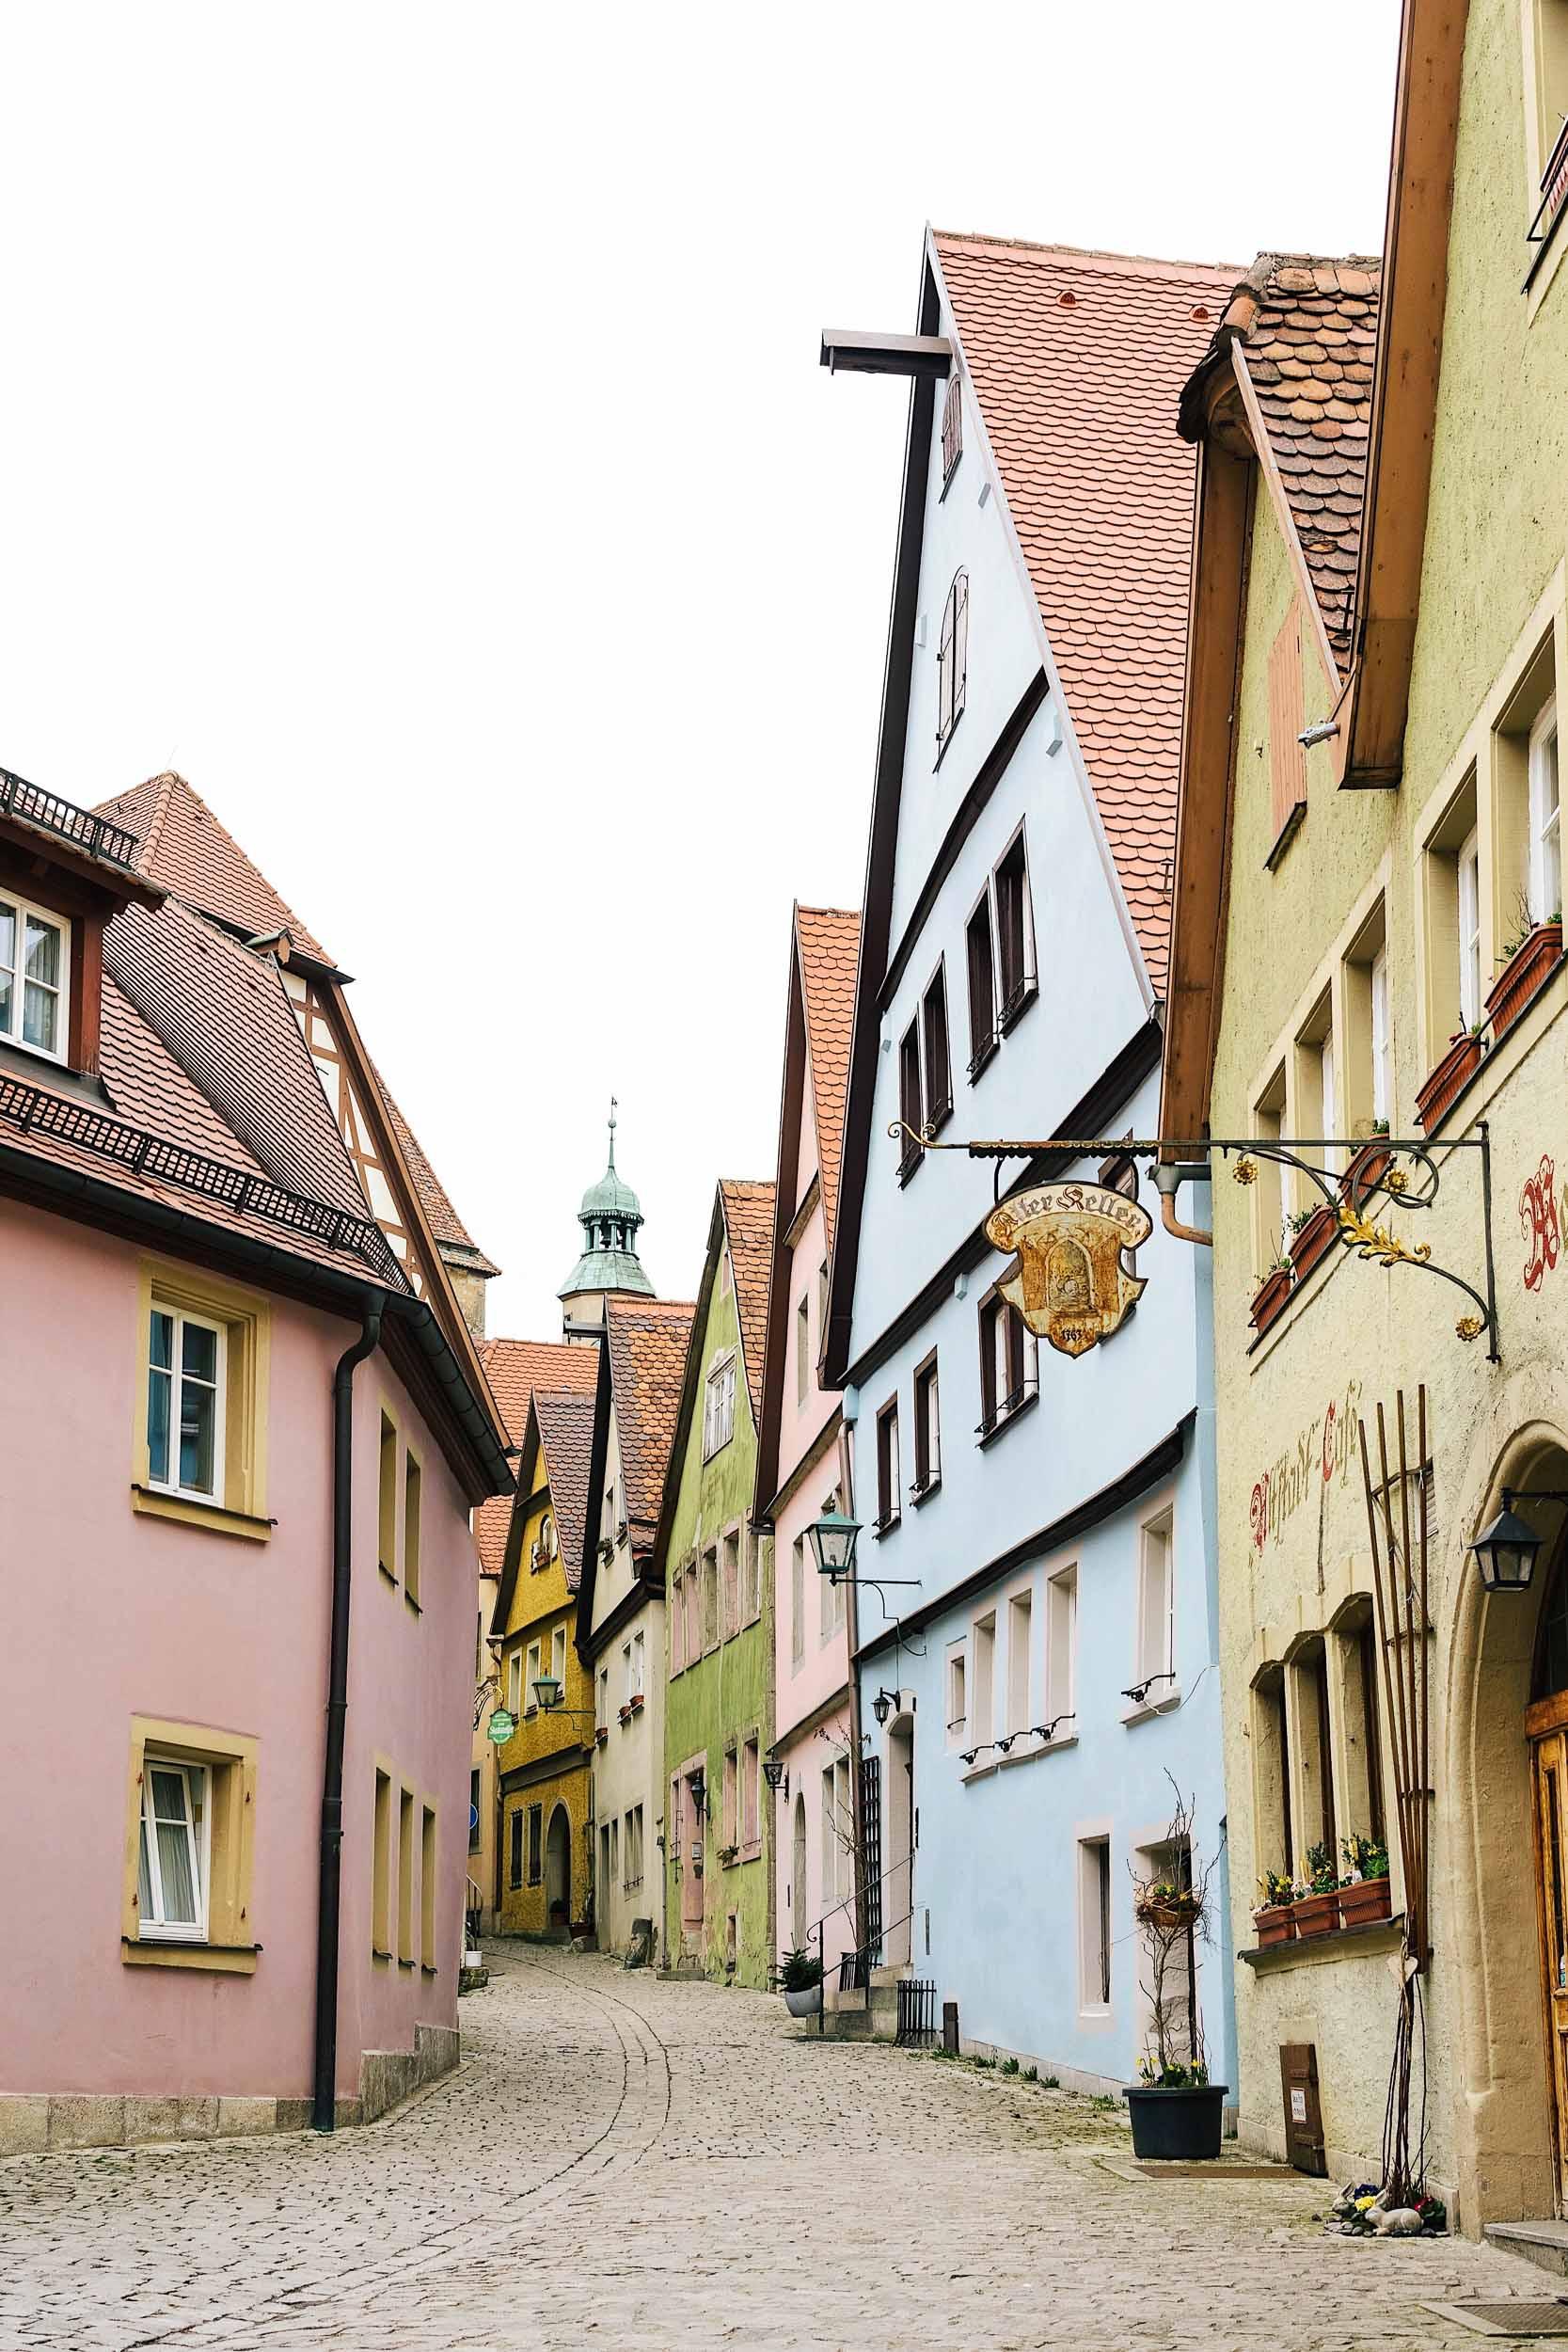 Cobblestone streets near Marktplatz in Rothenburg